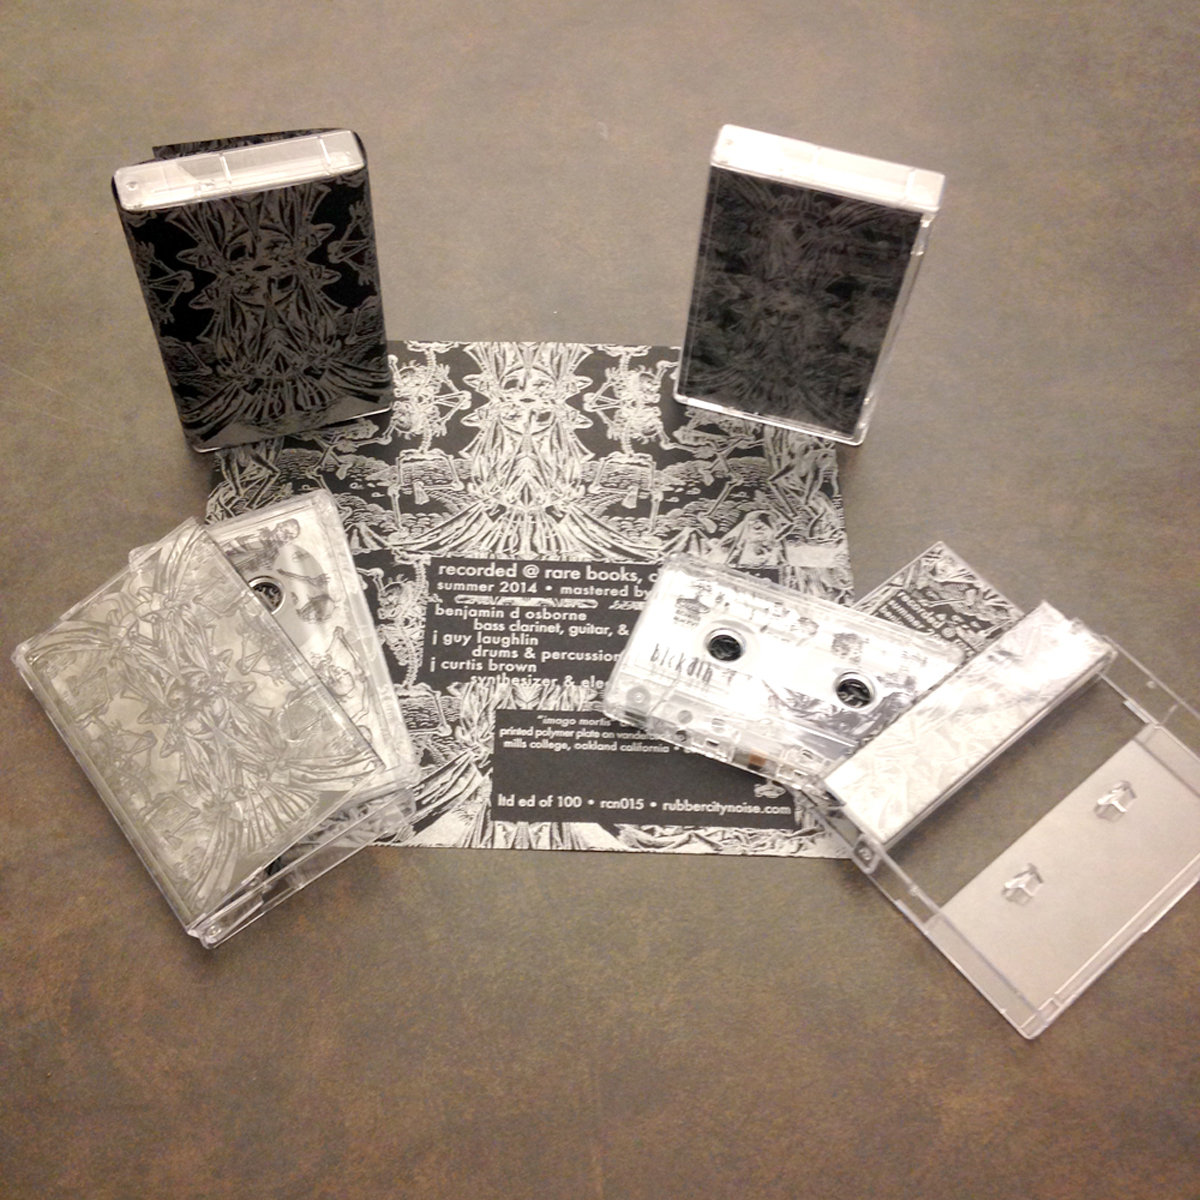 blckdth cassette